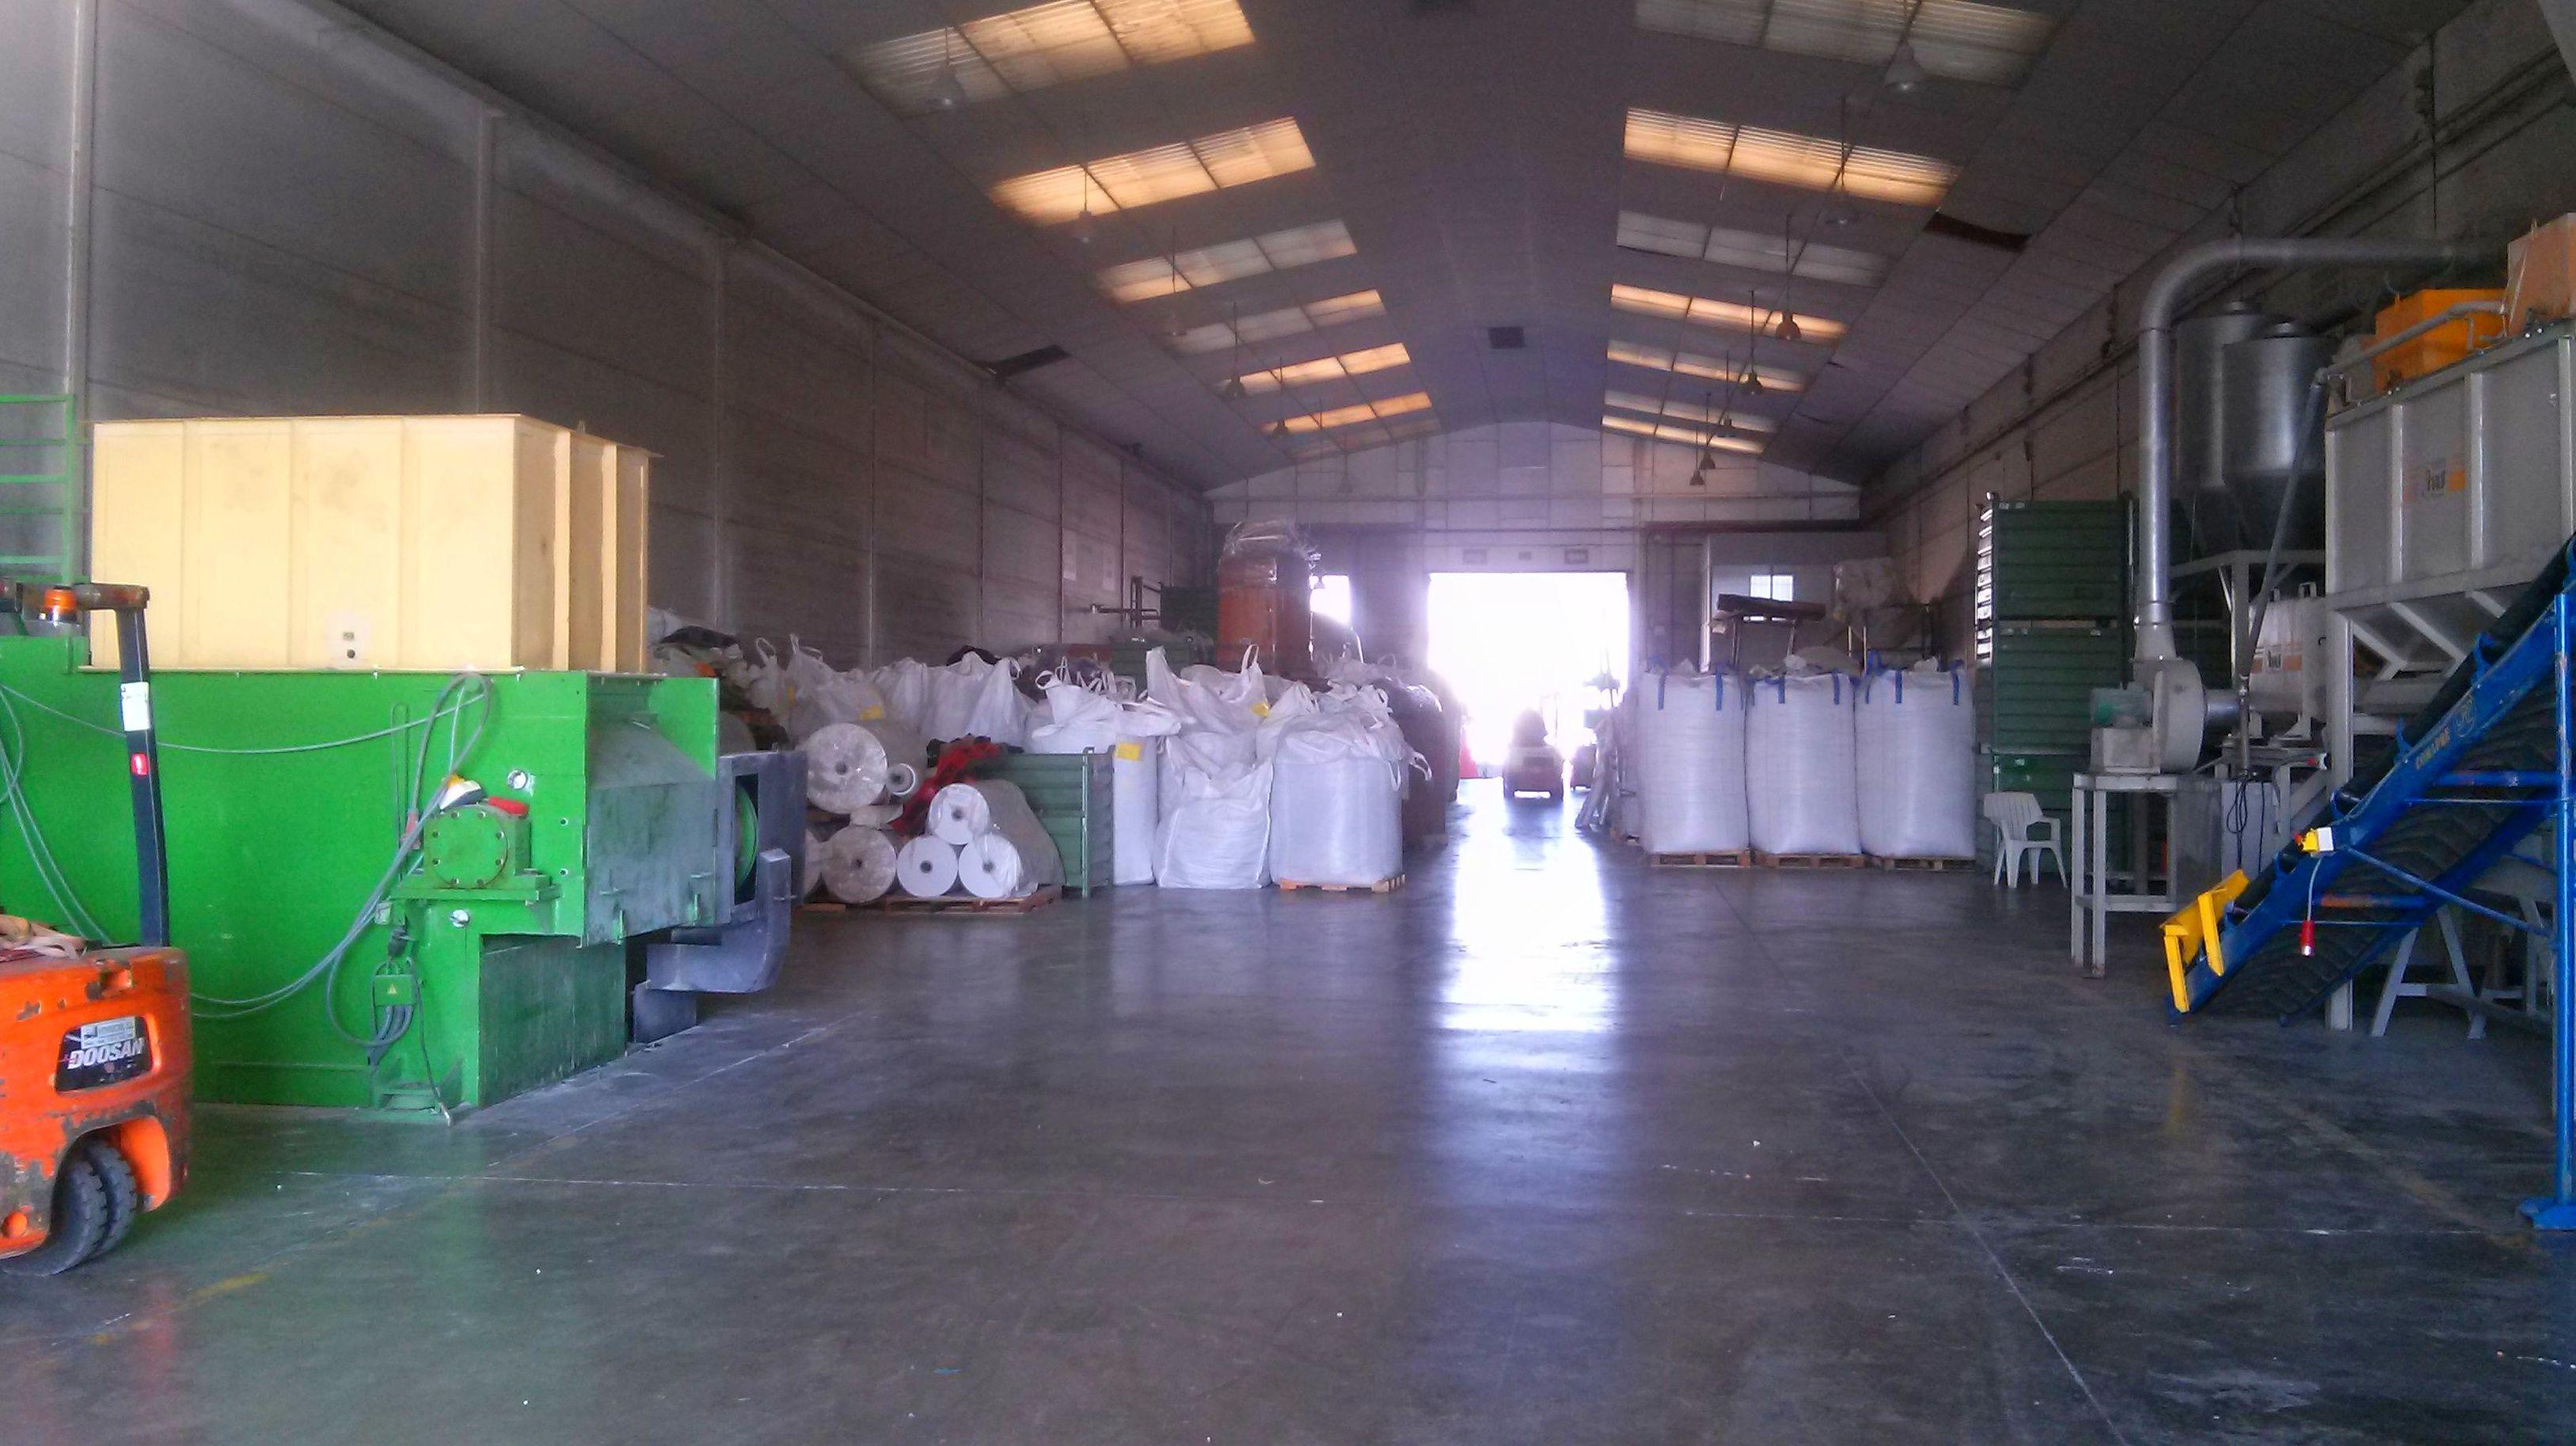 Foto 8 de Reciclaje de residuos en Manises | PalePlast, S. L.